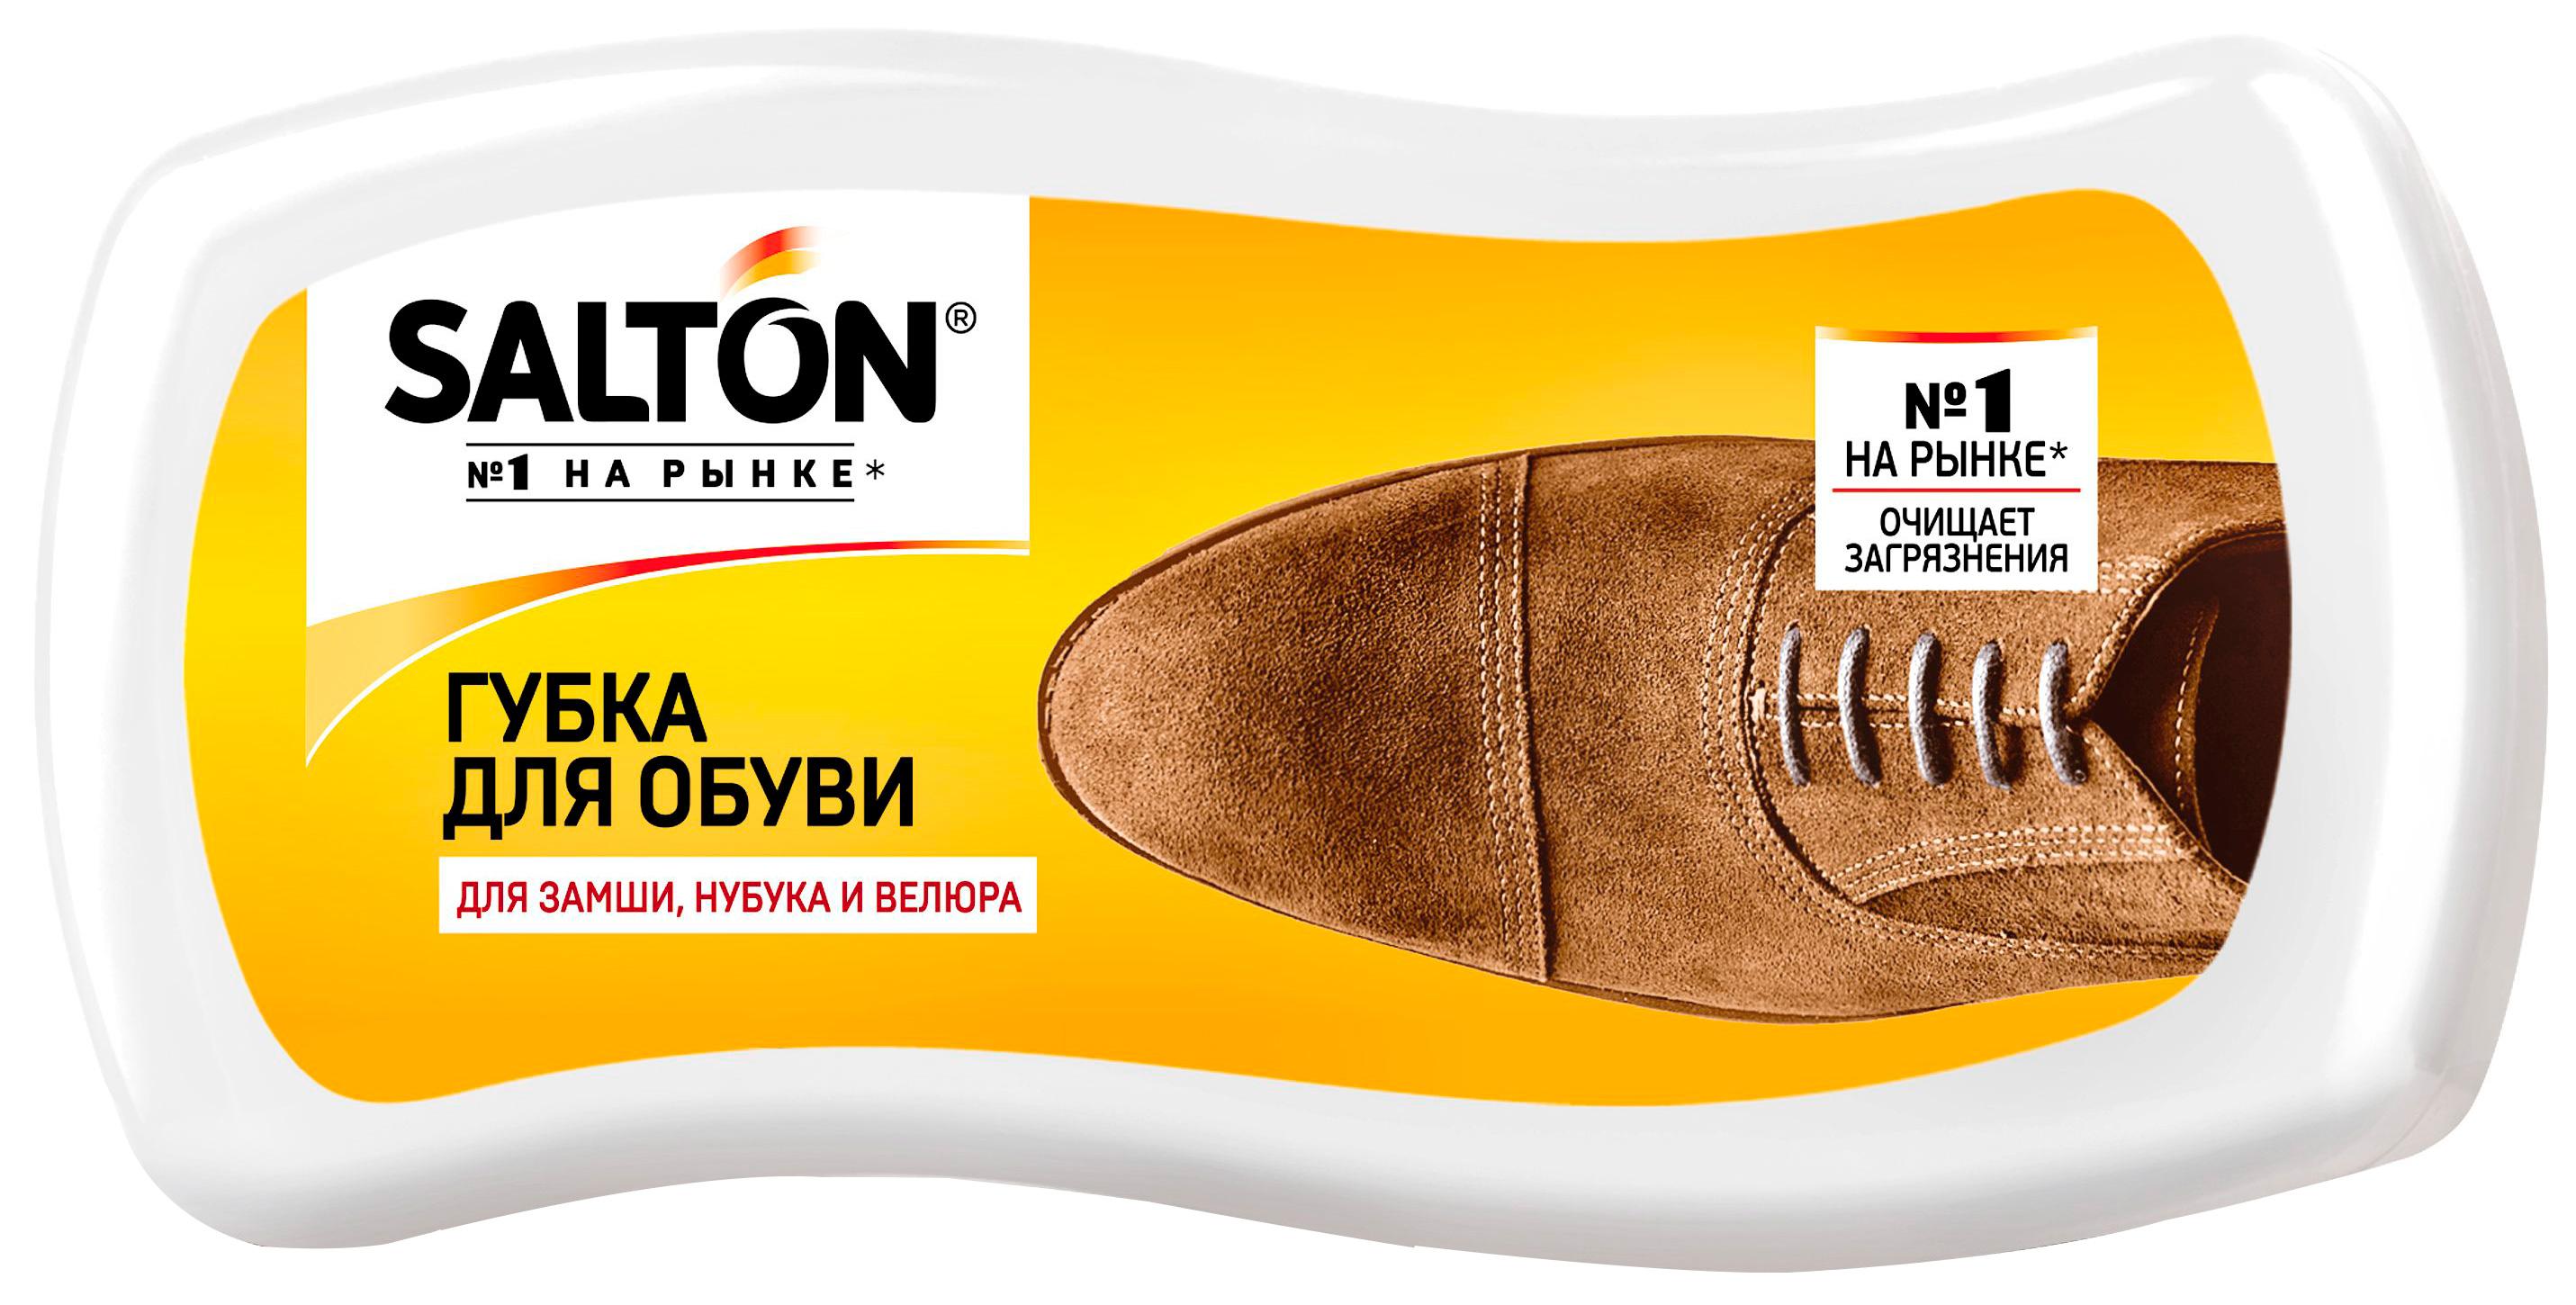 Губка для обуви Salton губка   волна